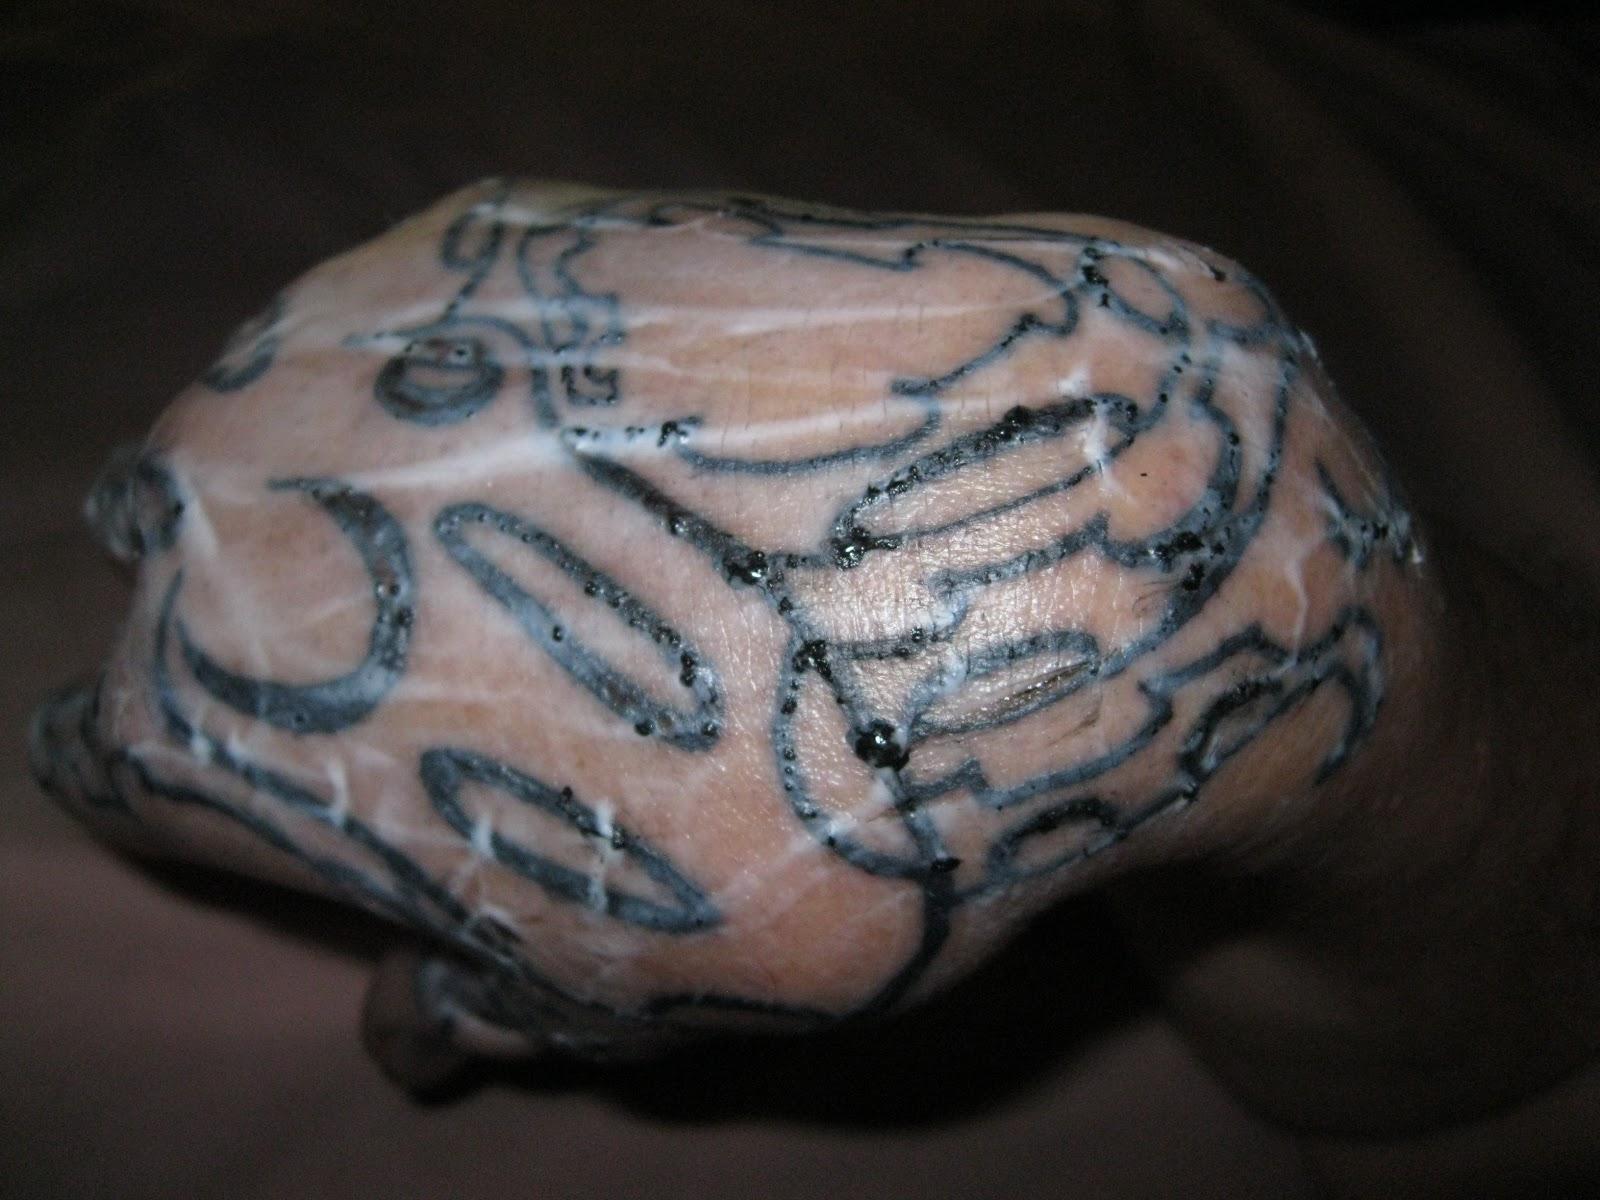 Blue ringed octopus tattoo james bond - photo#20